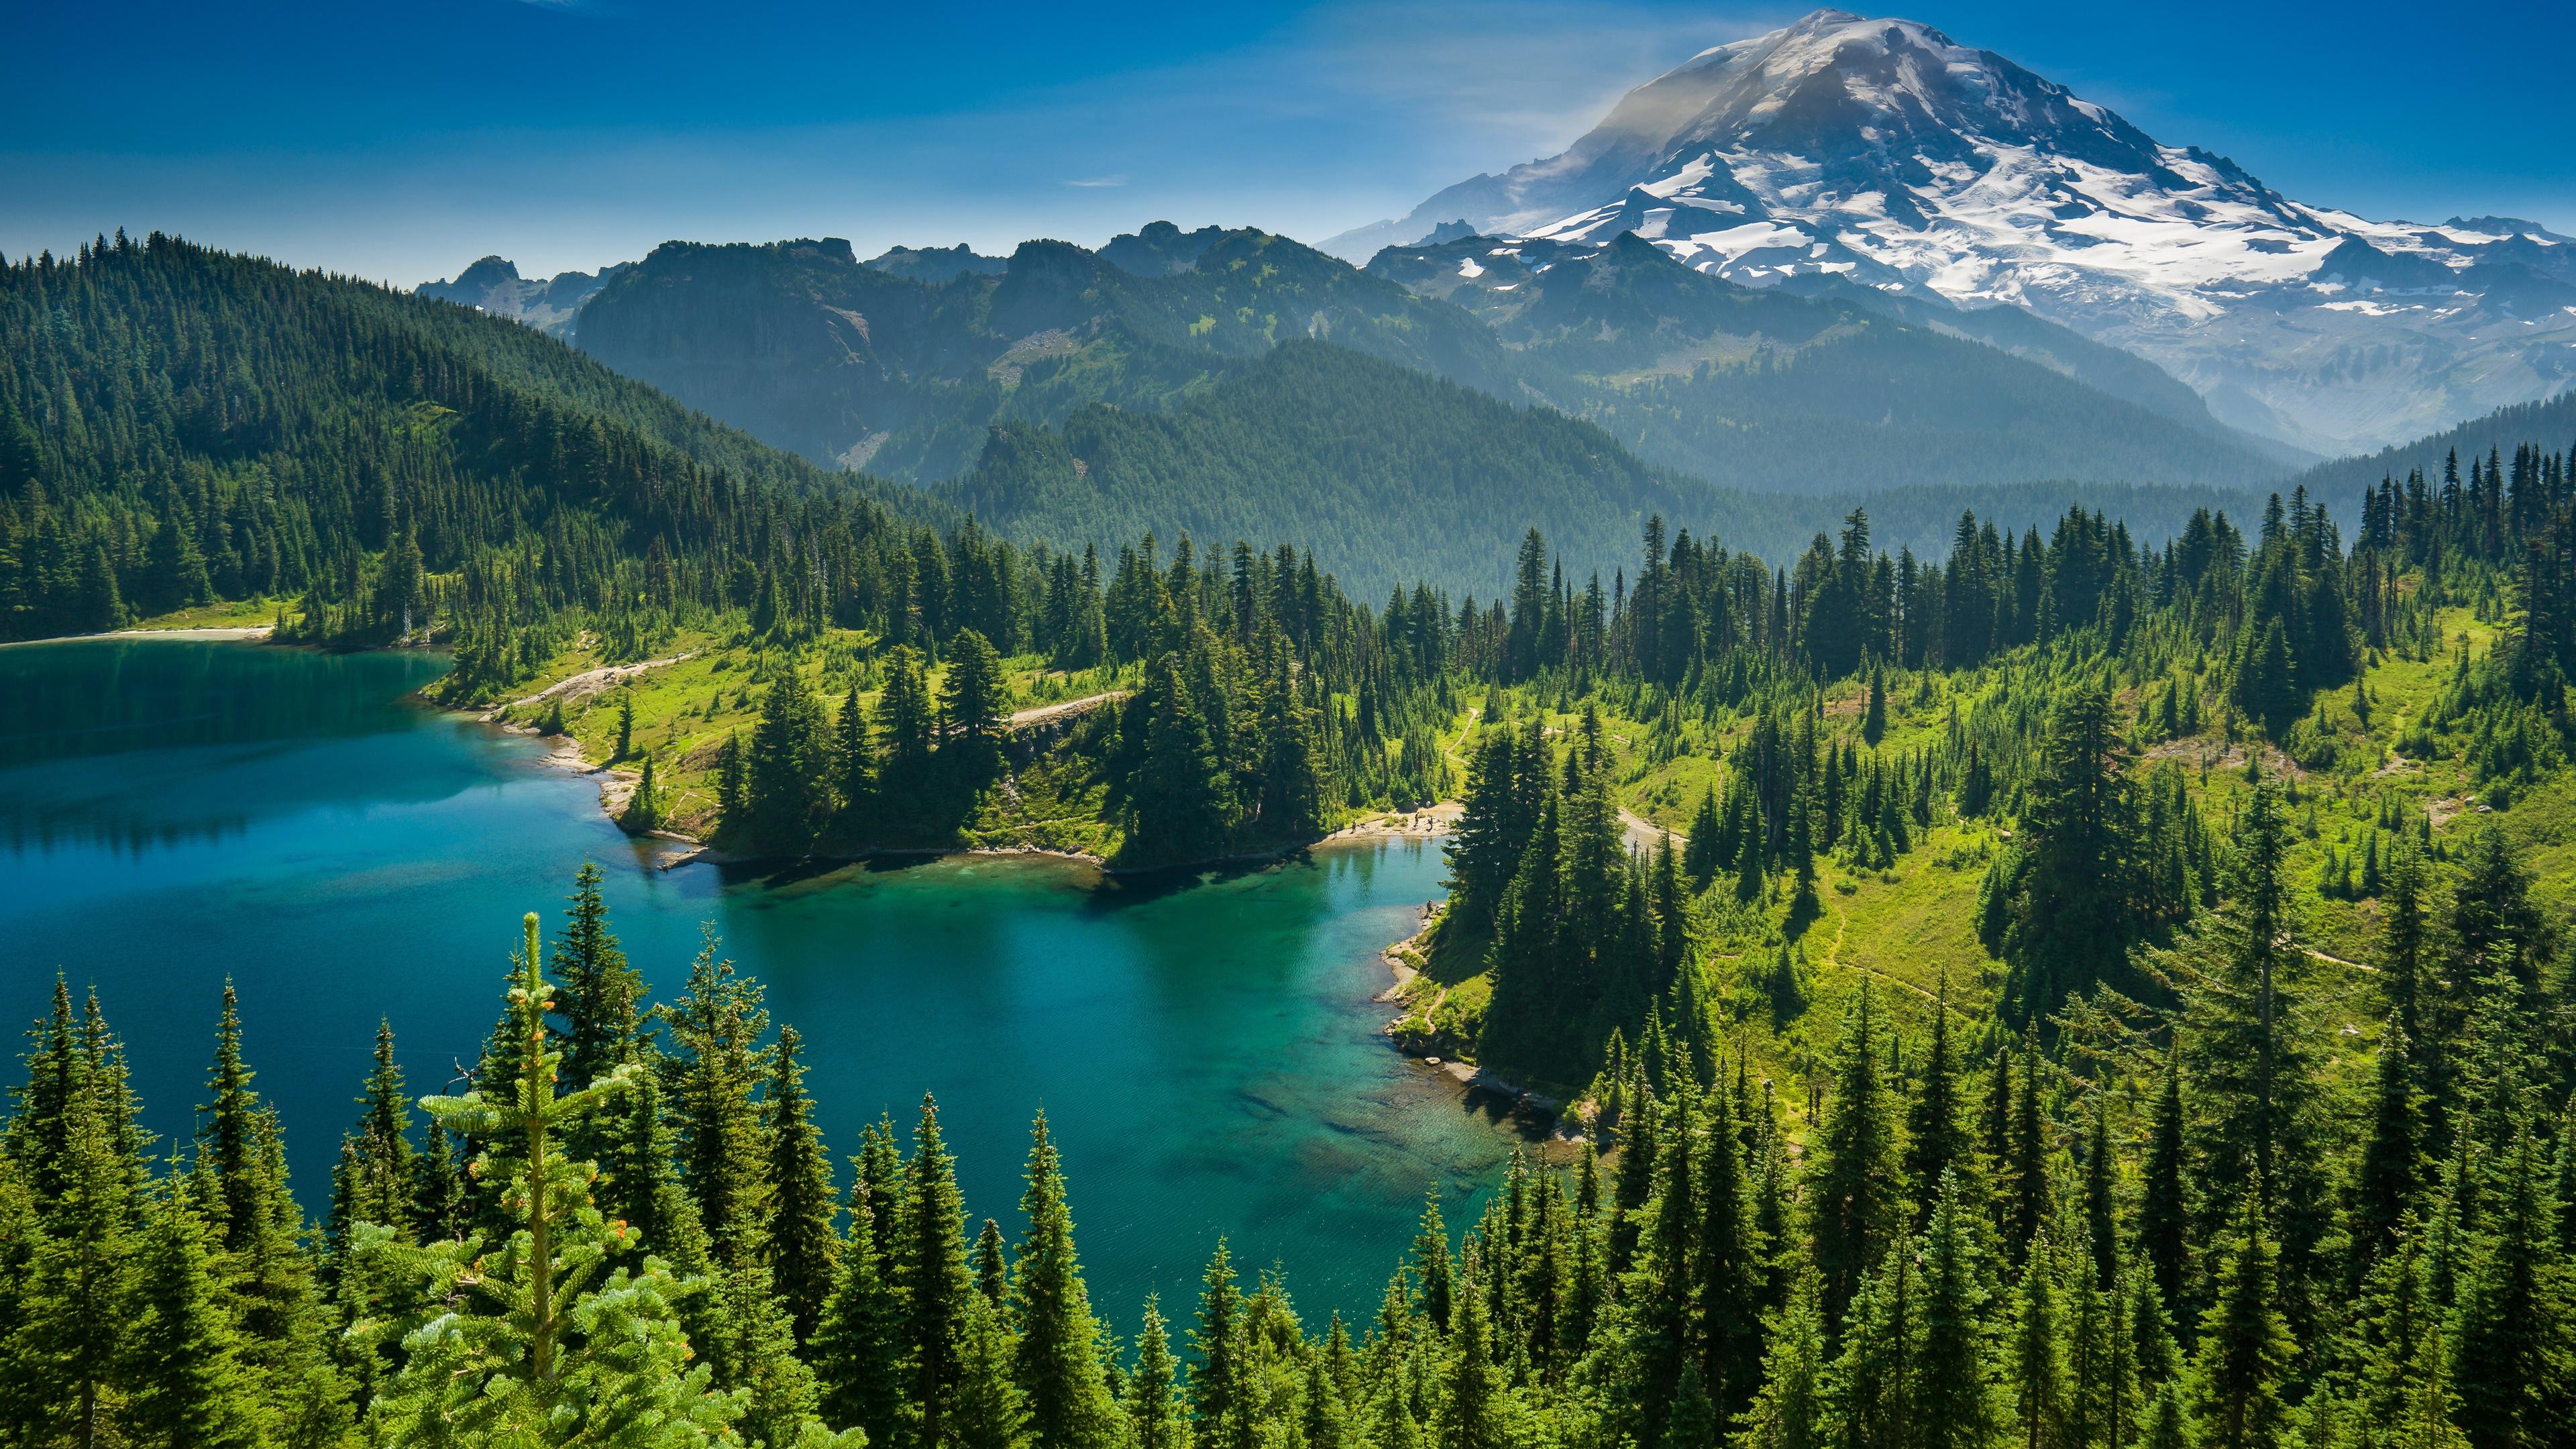 Mount Rainier National Park wallpaper